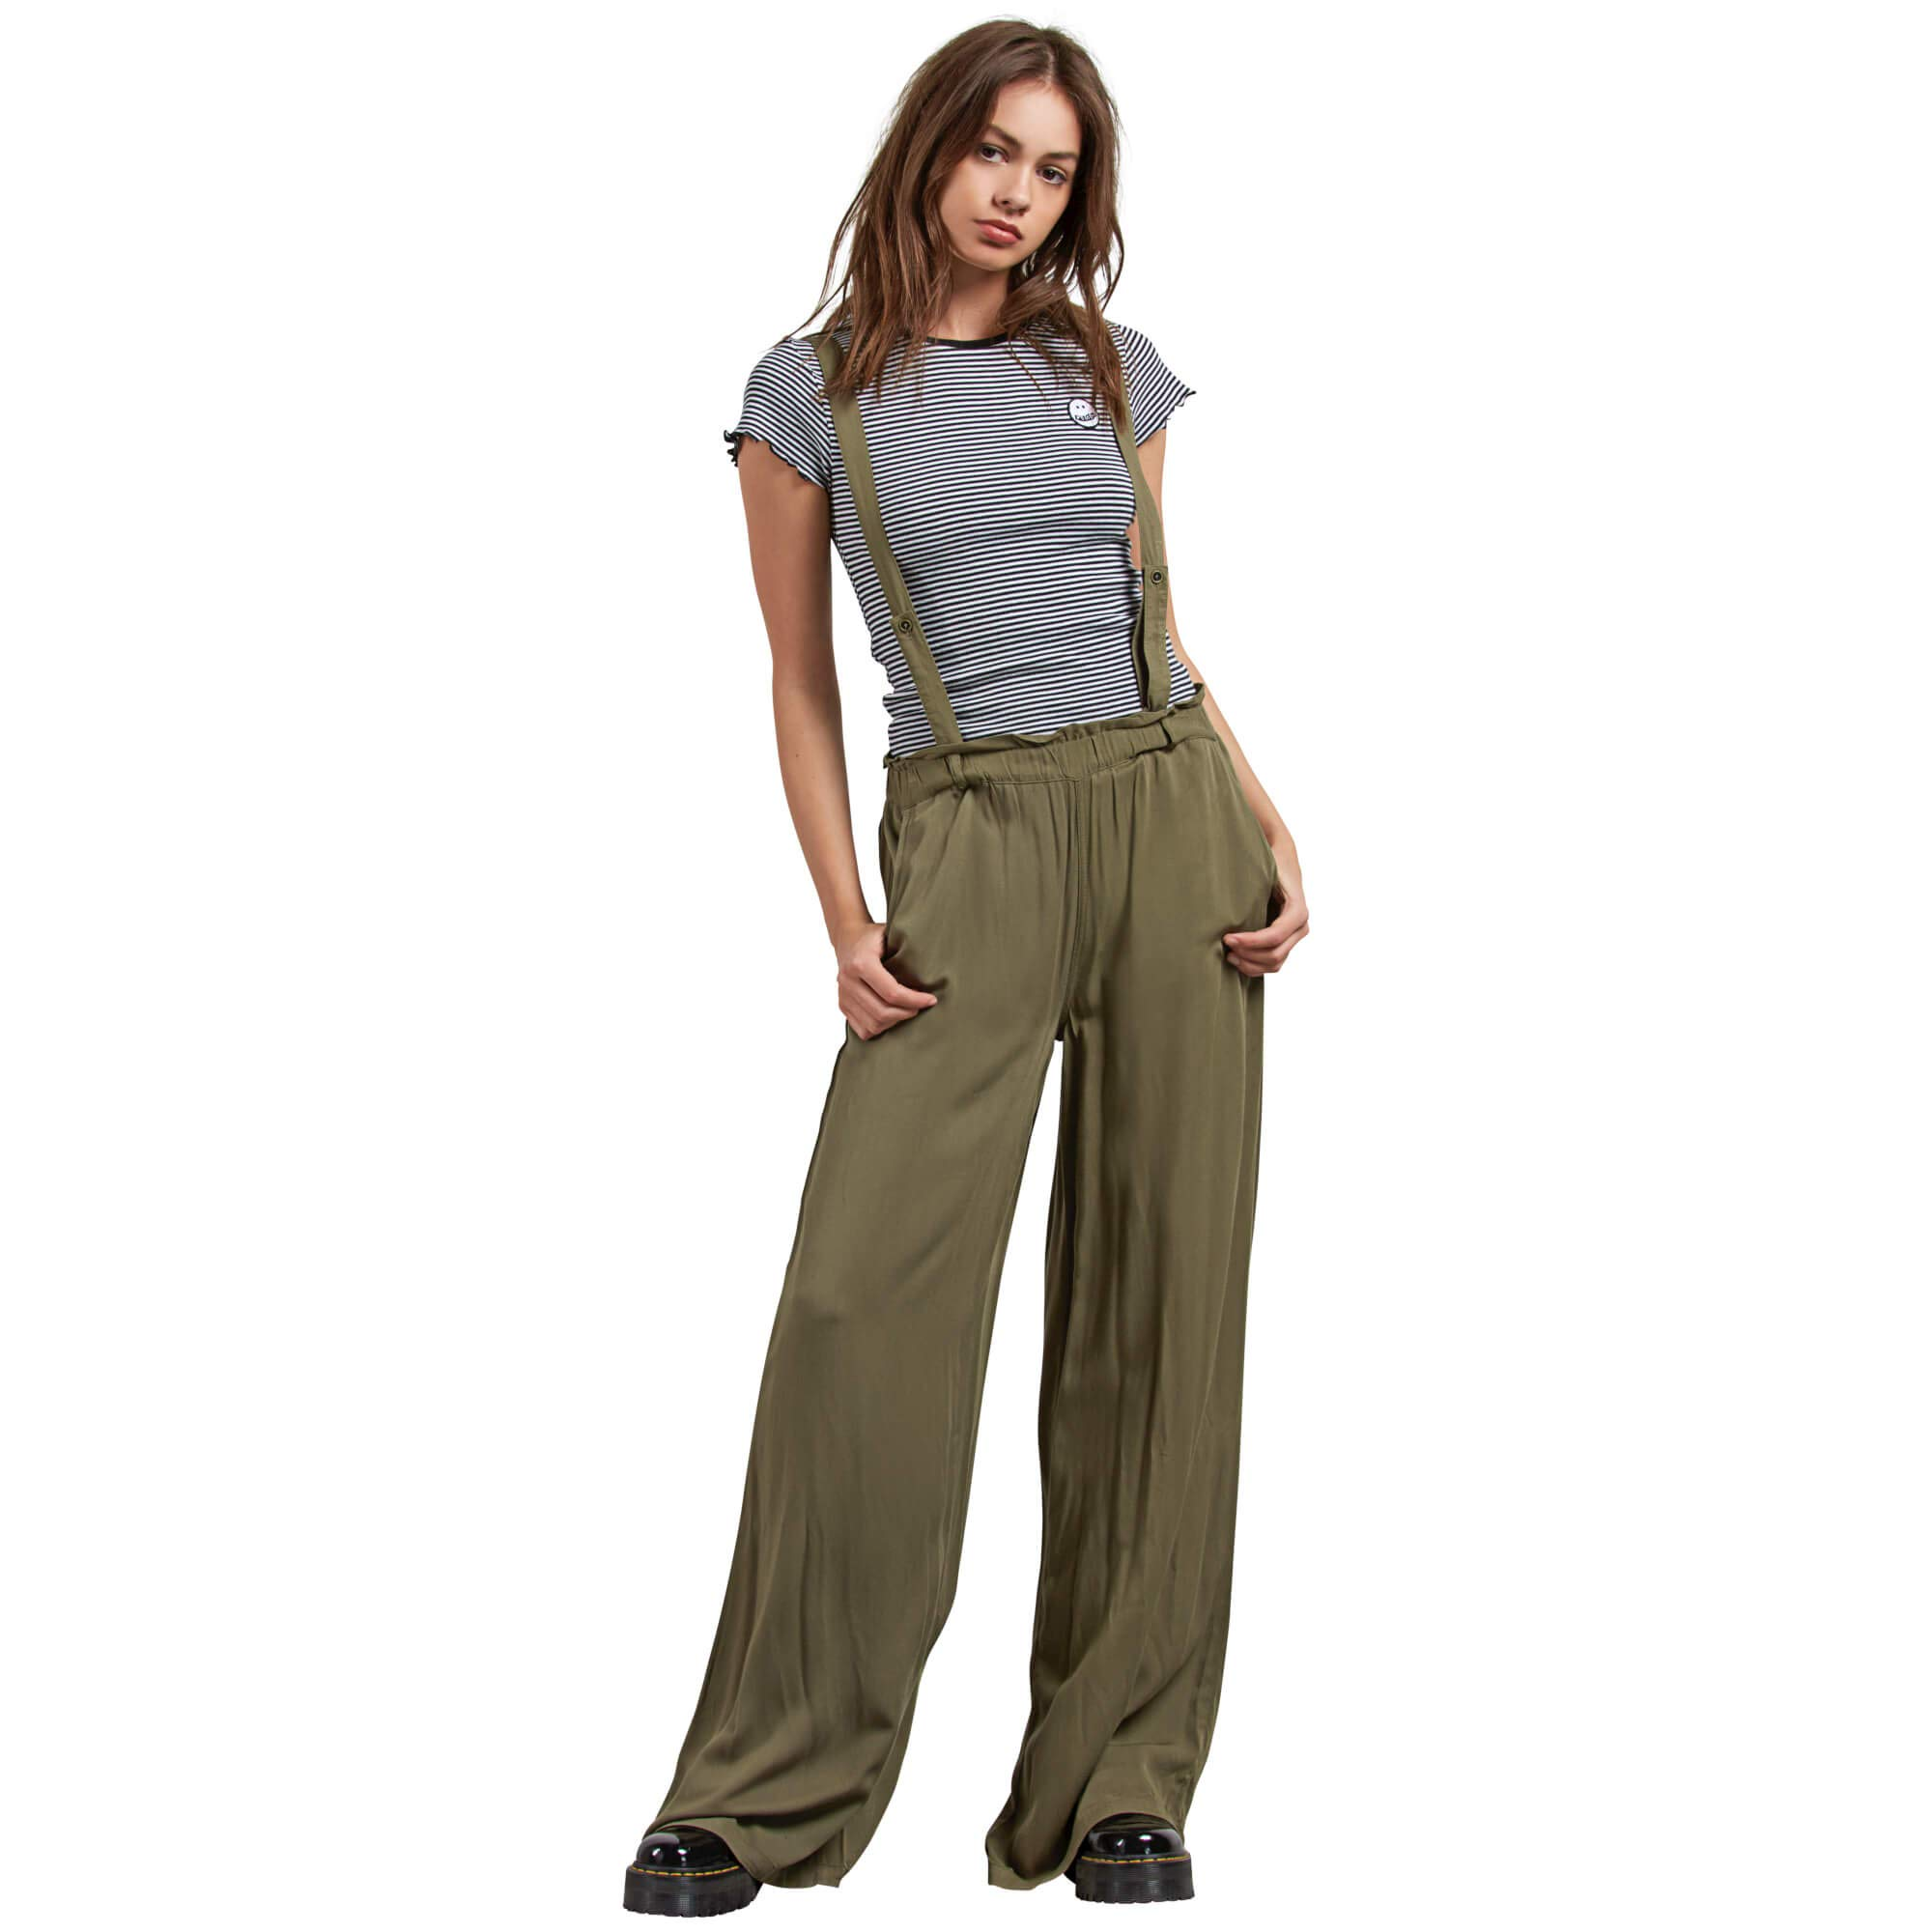 Volcom Junior's Dreamt It Up High Waisted Wide Leg Suspender Pants, Dark camo, Small